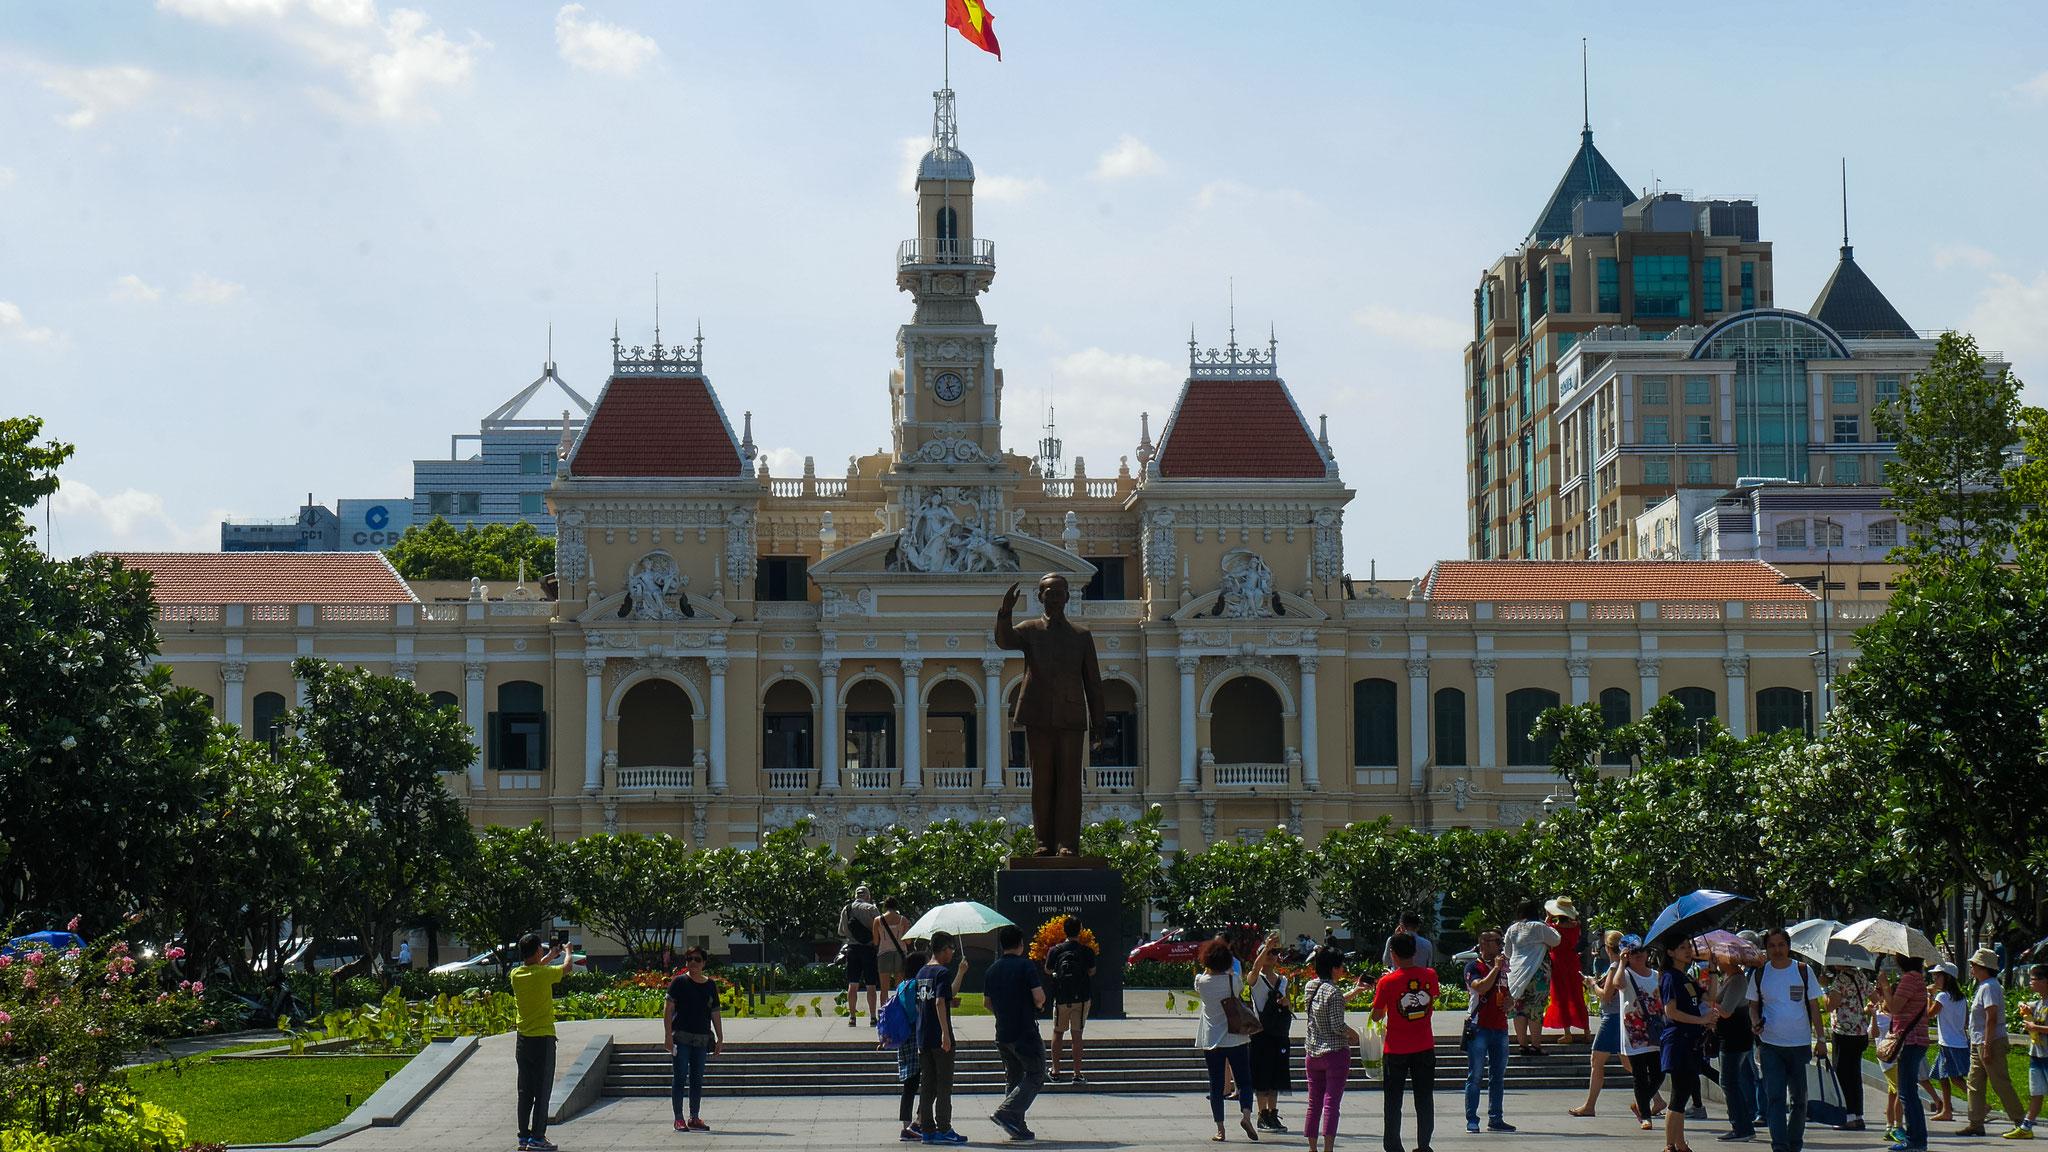 Ho-Chi-Minh-Stadt (Saigon) - Rathaus